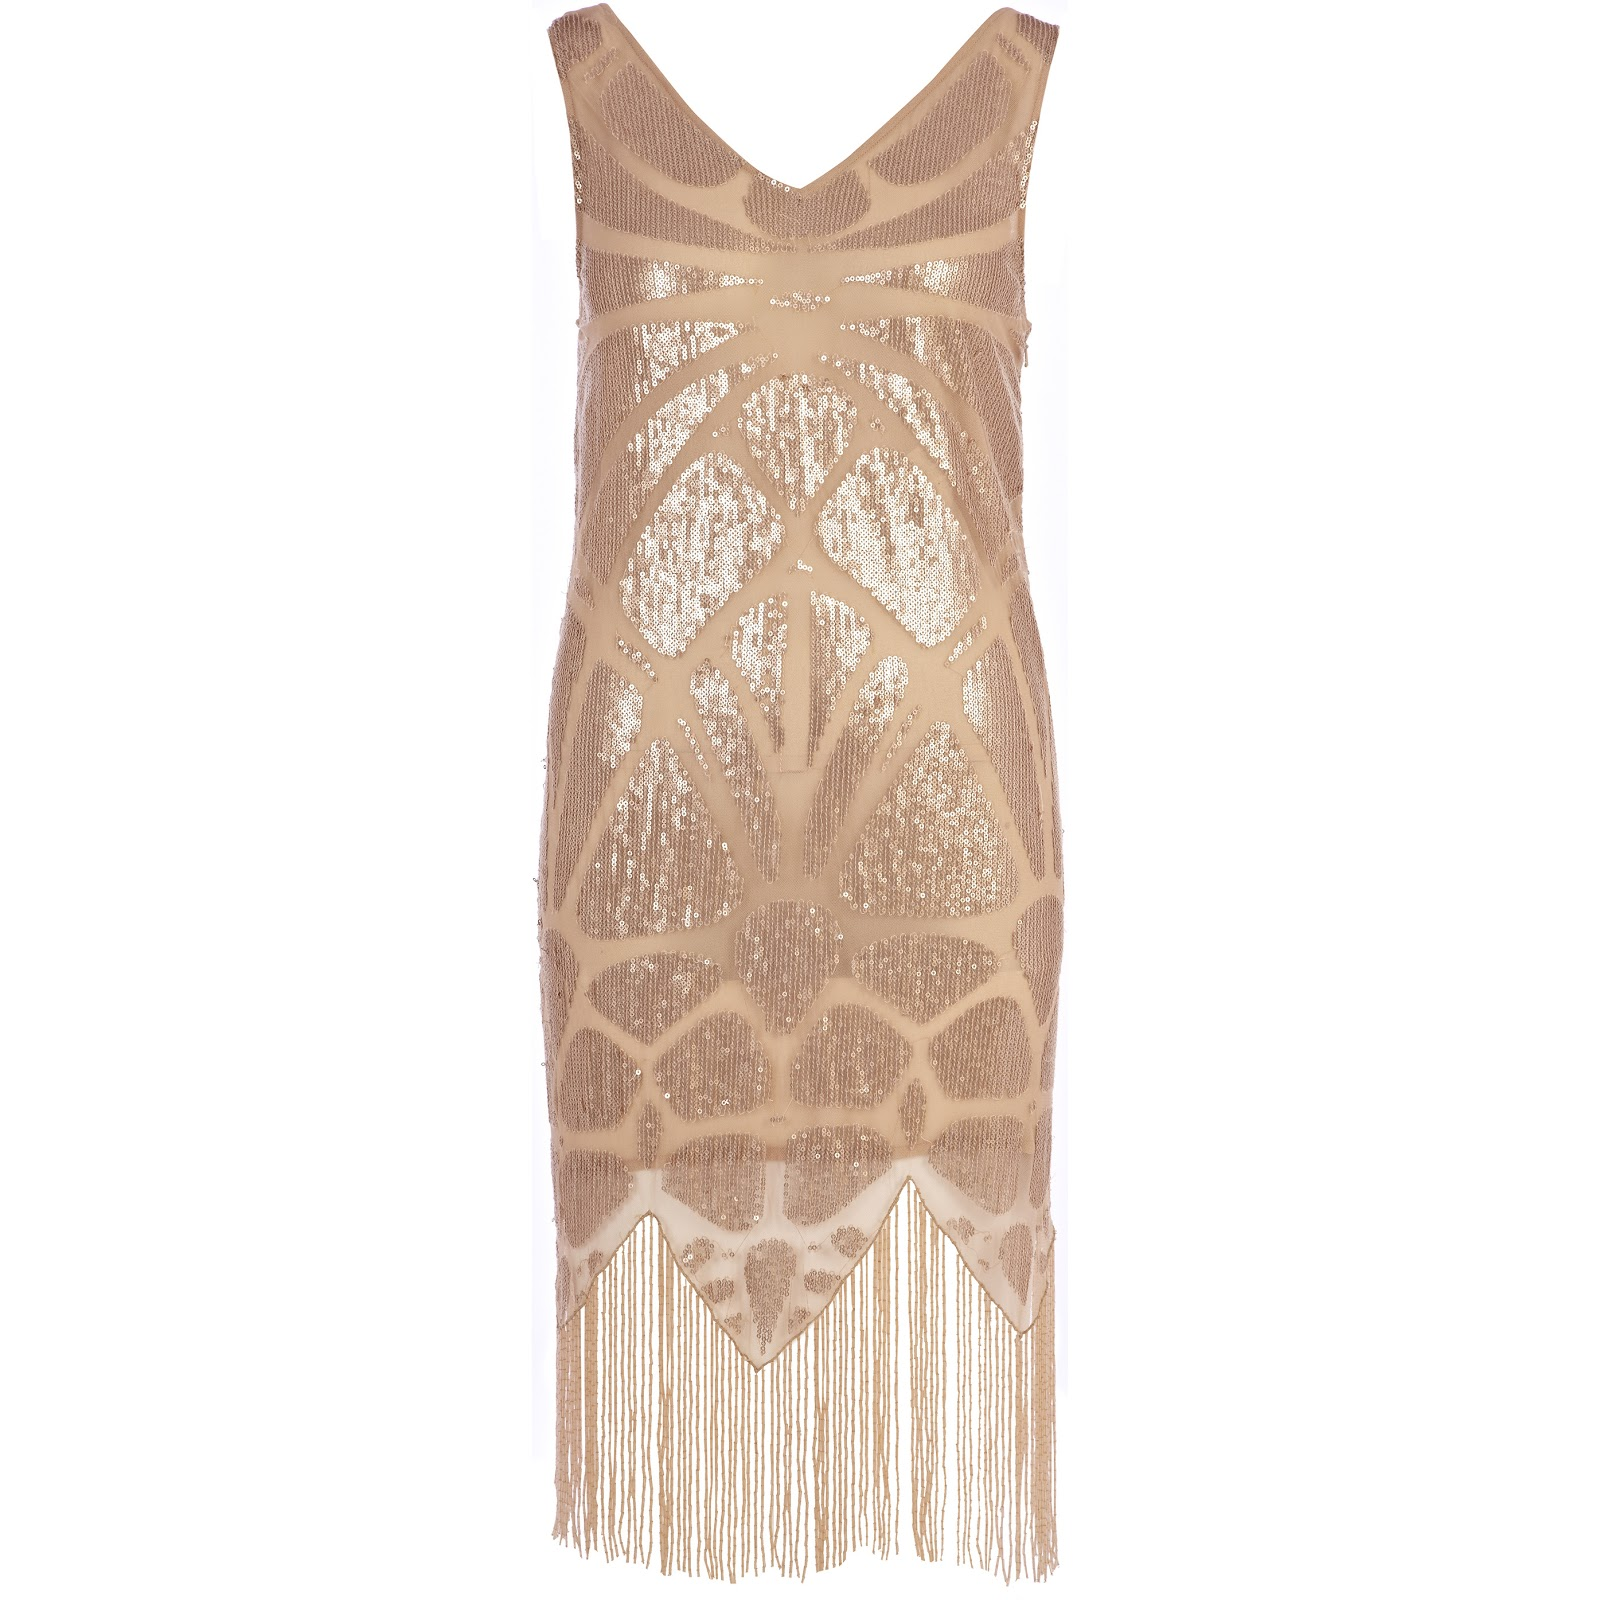 fashion ideal: My Dream Flapper Girl Dresses...